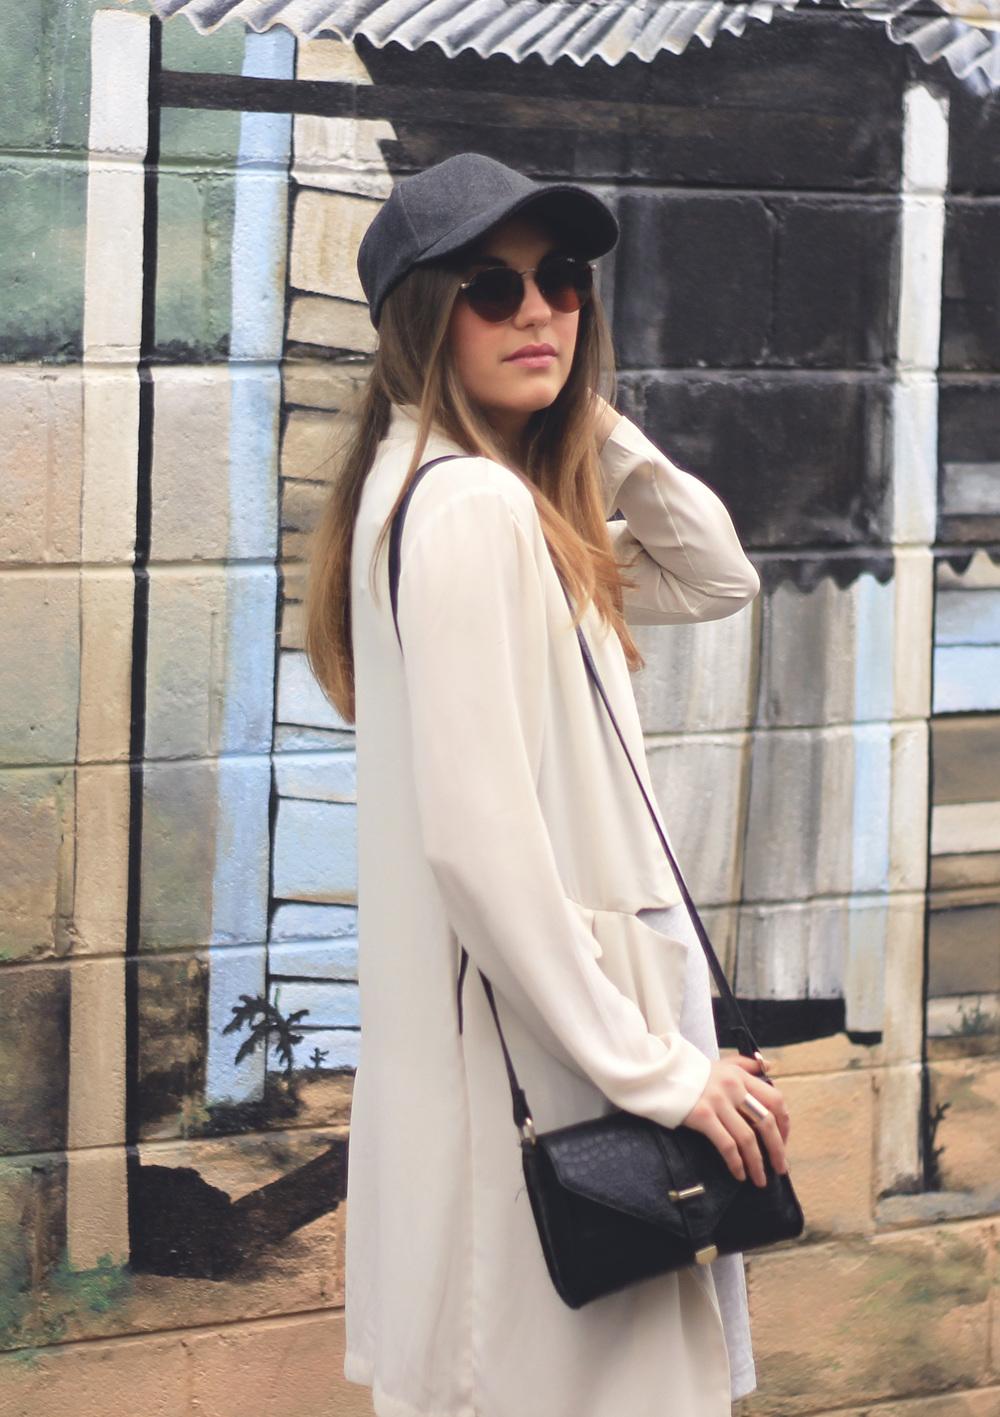 black pebbled box bag forever 21 cream kimono wool cap sunglasses